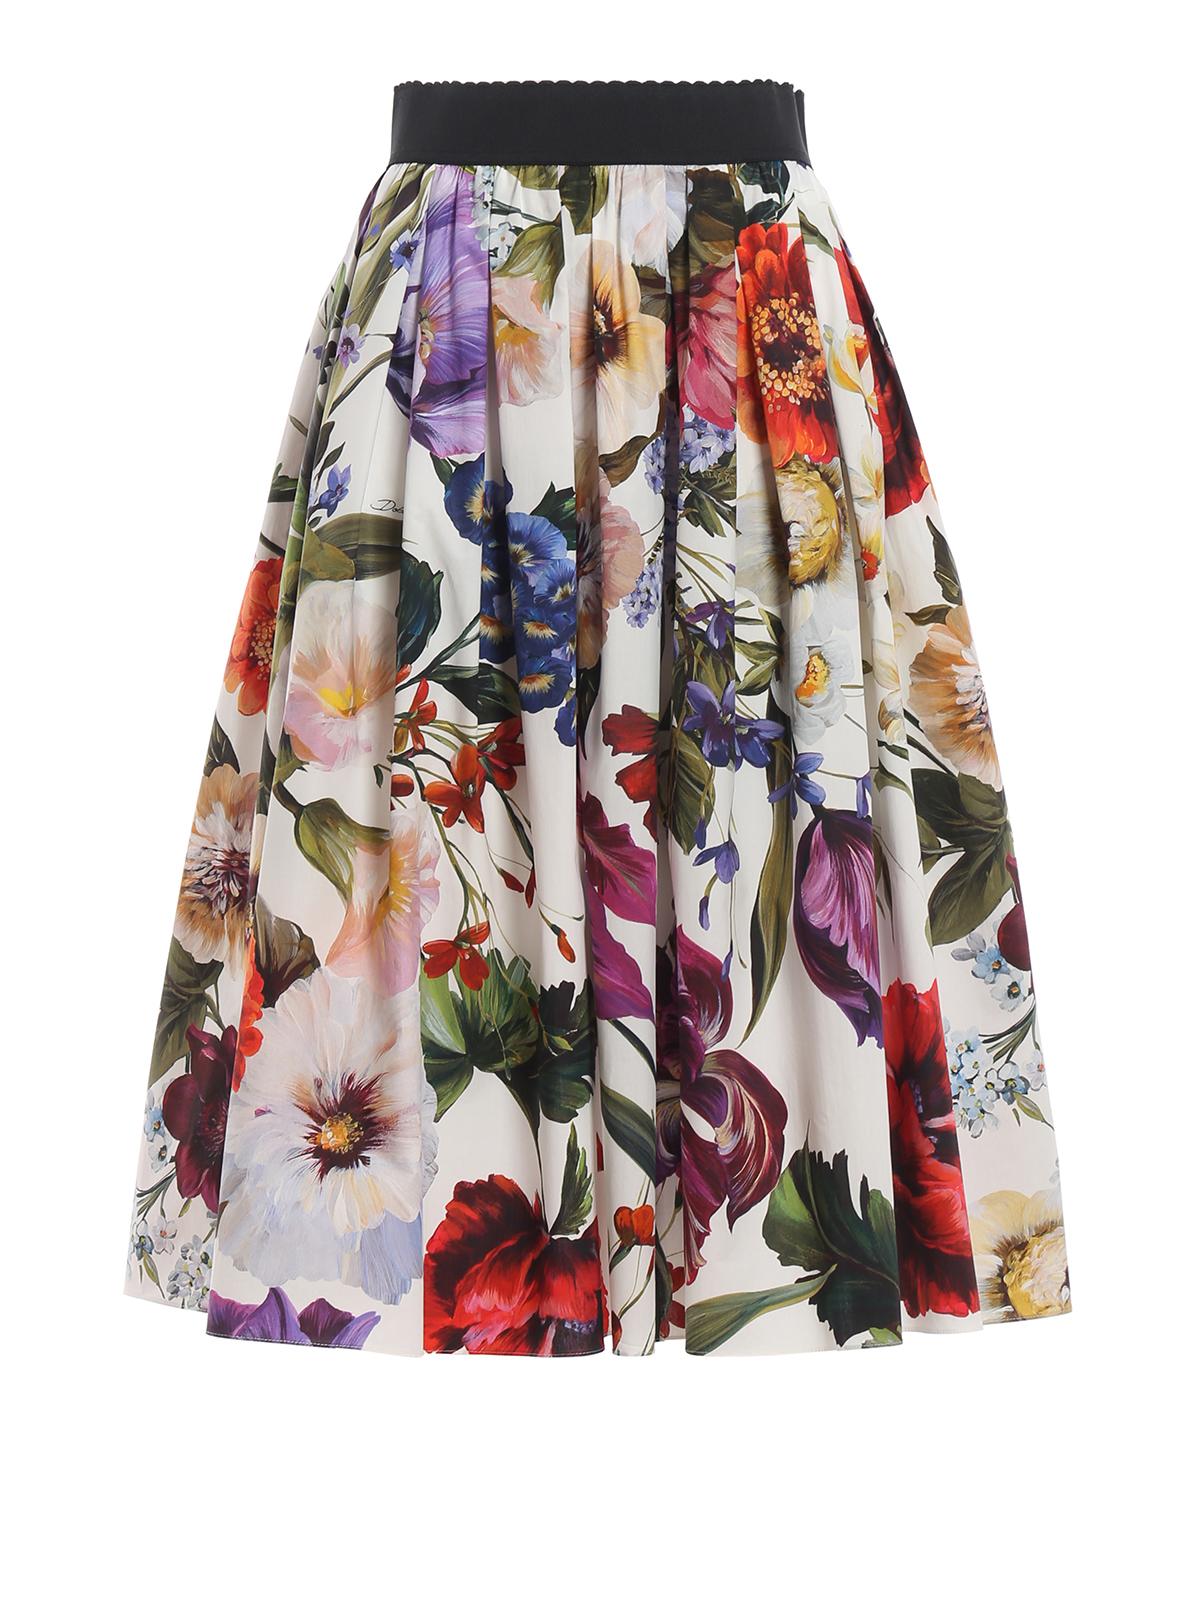 metà fuori d6045 14b97 Dolce & Gabbana - Gonna stampa fiori - gonne al ginocchio e ...